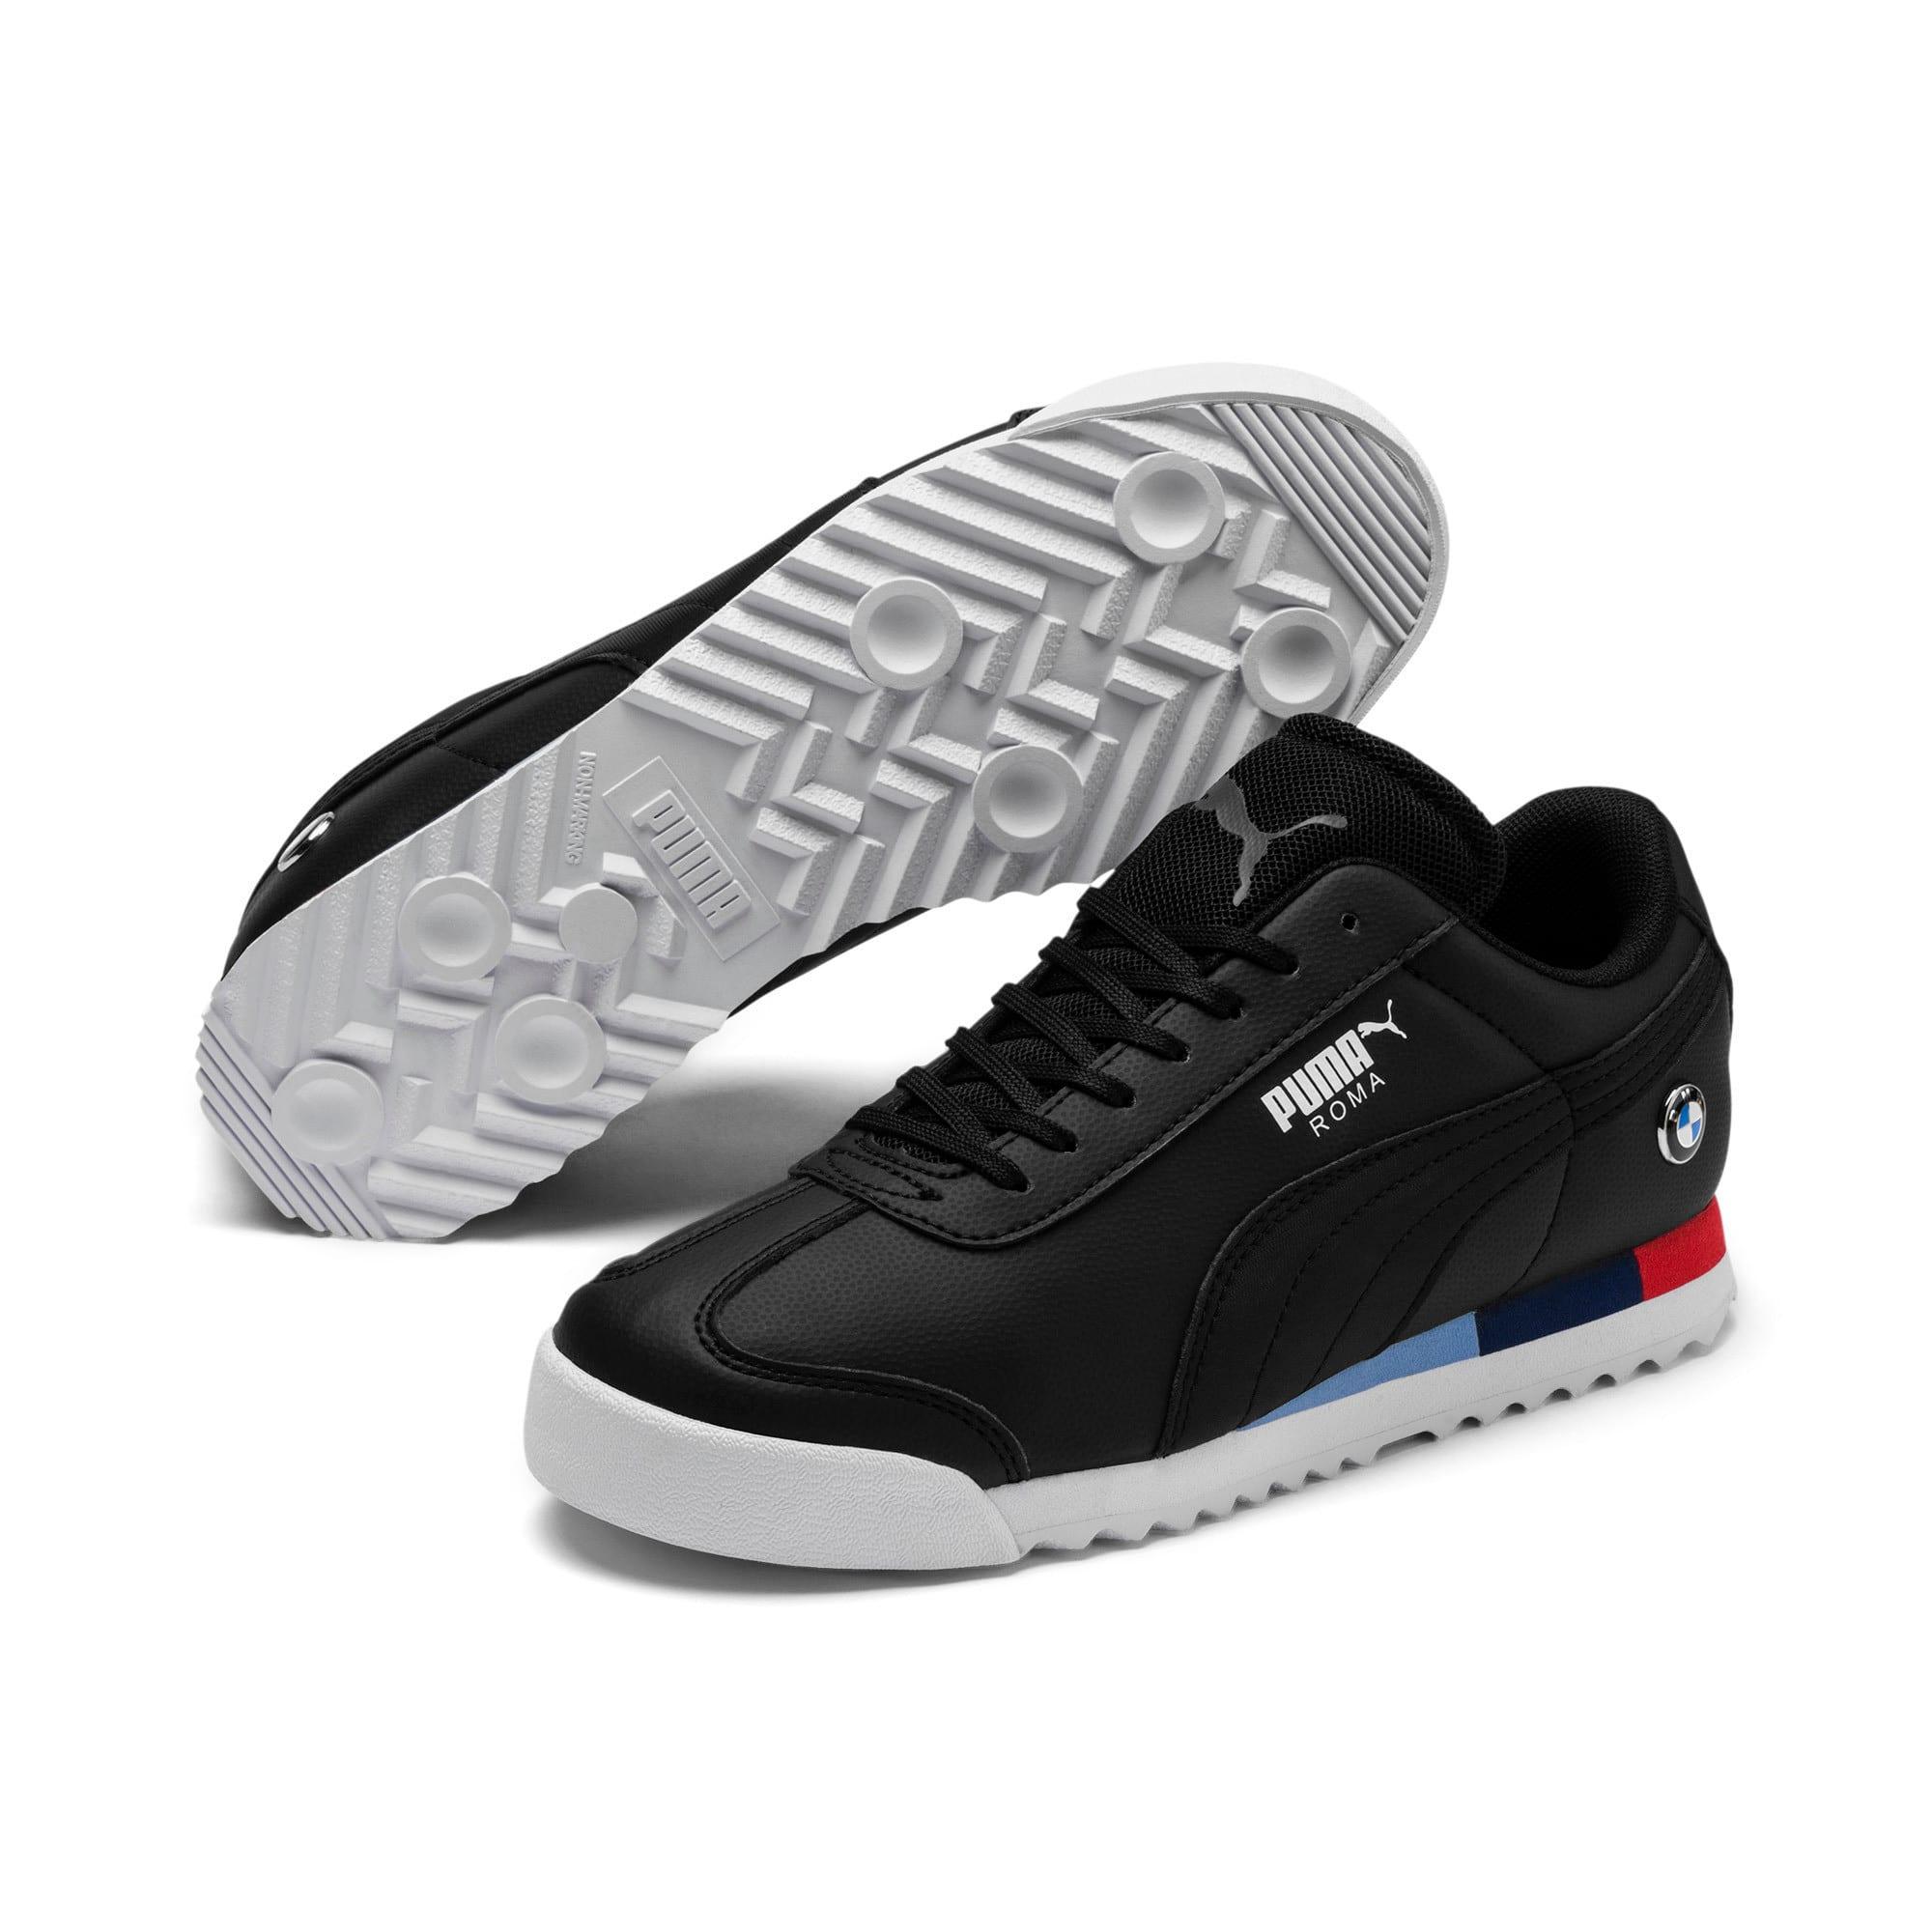 Thumbnail 2 of BMW M Motorsport Roma Sneakers JR, Puma Black-Puma Black, medium